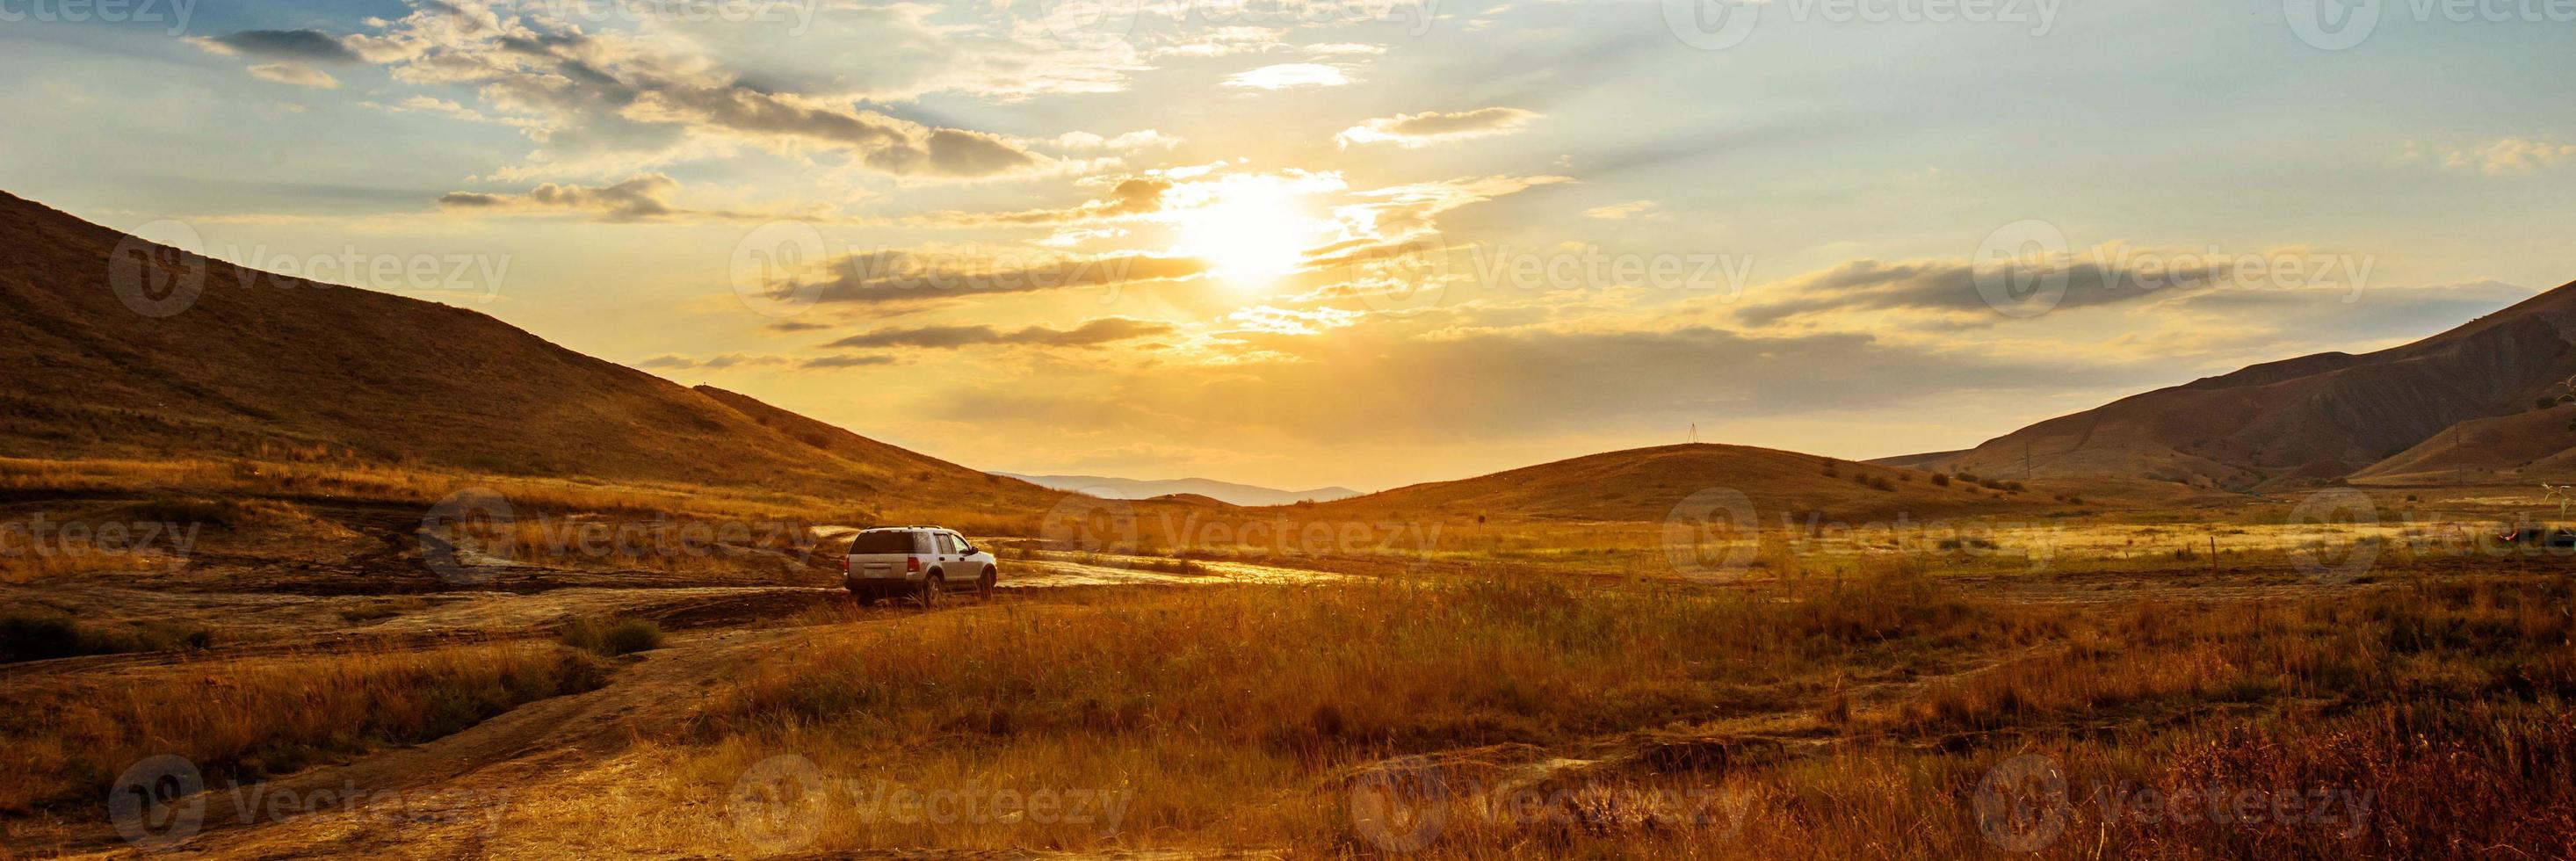 car at sunset photo